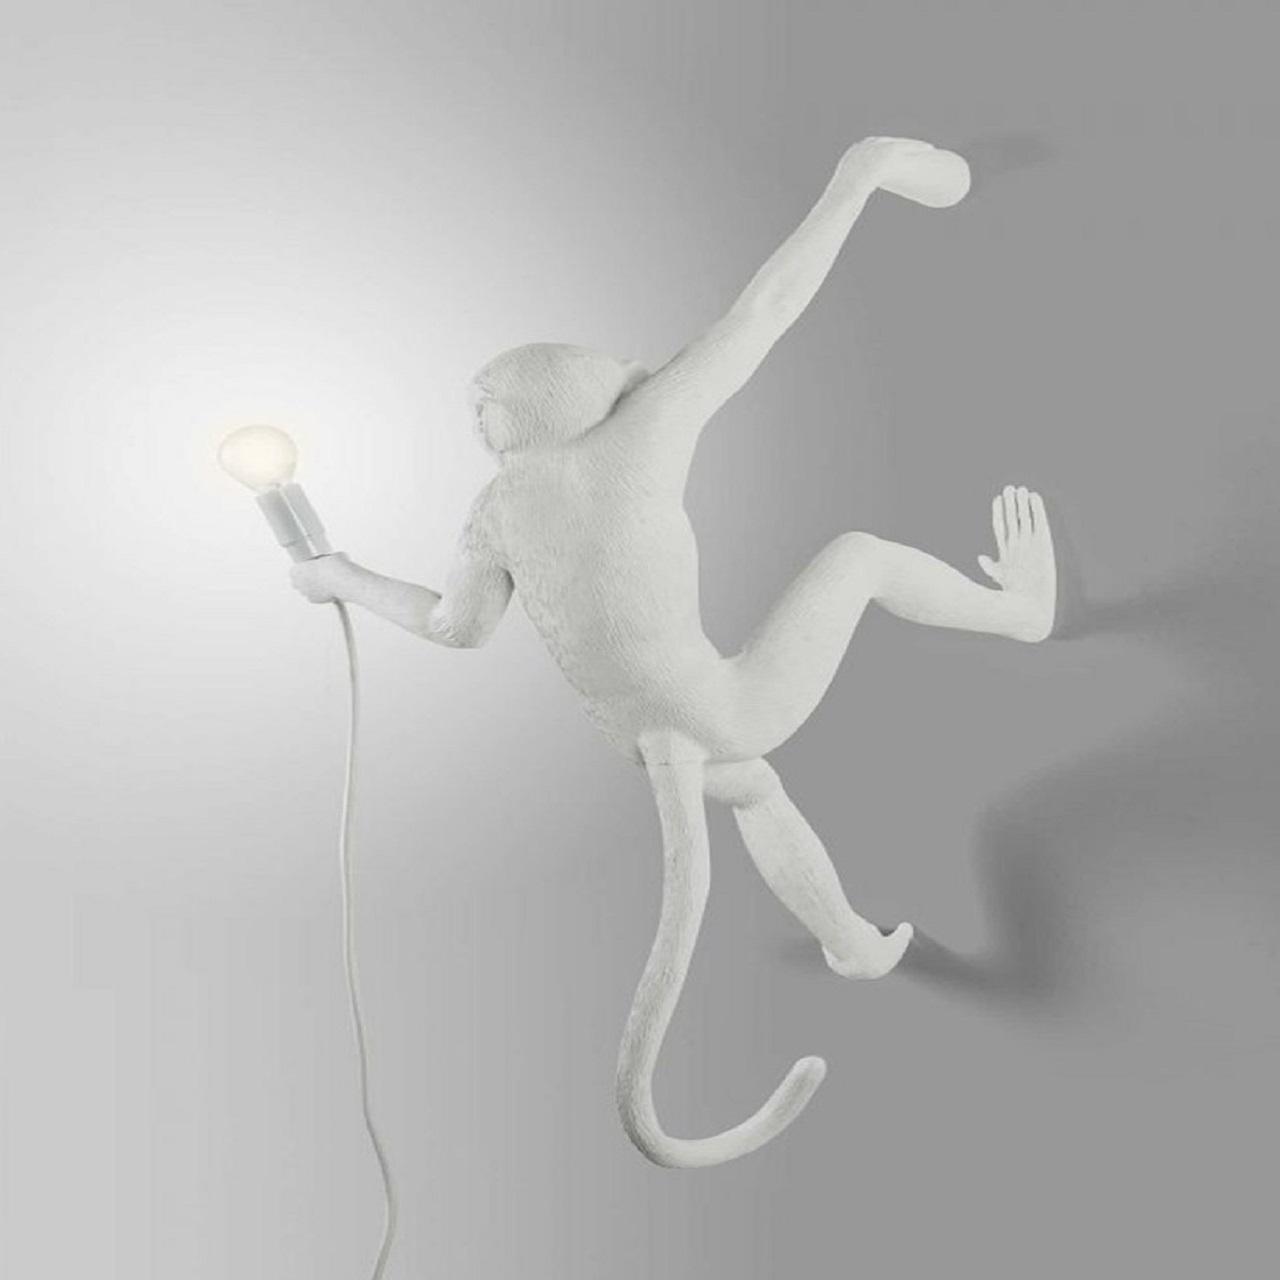 Monkey Lamp pendurado direita | Branco